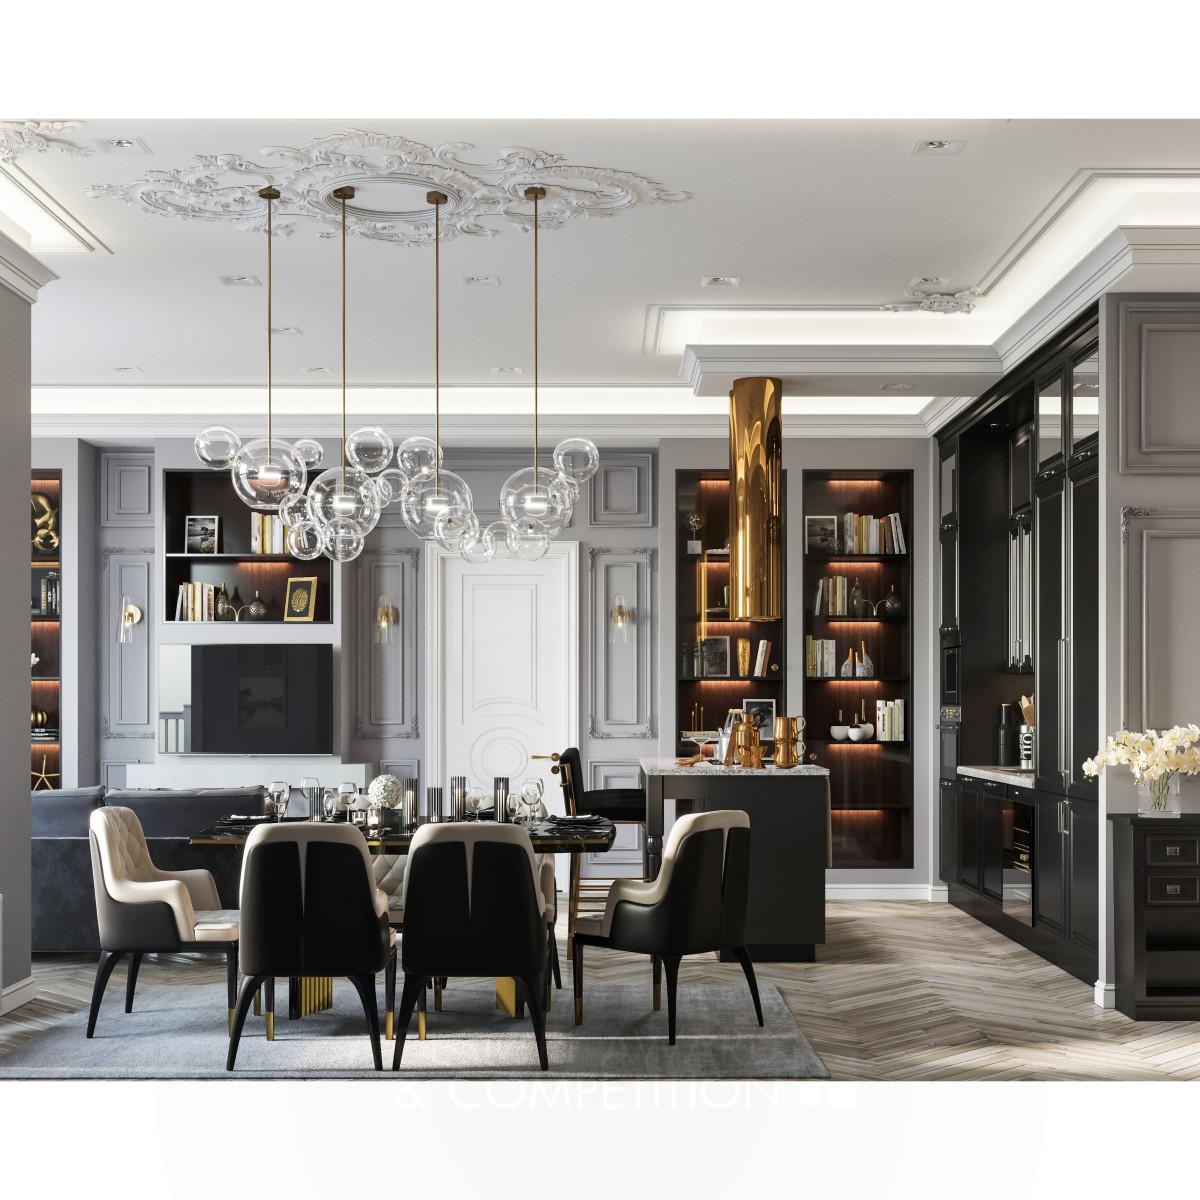 Gray and Gold interior design